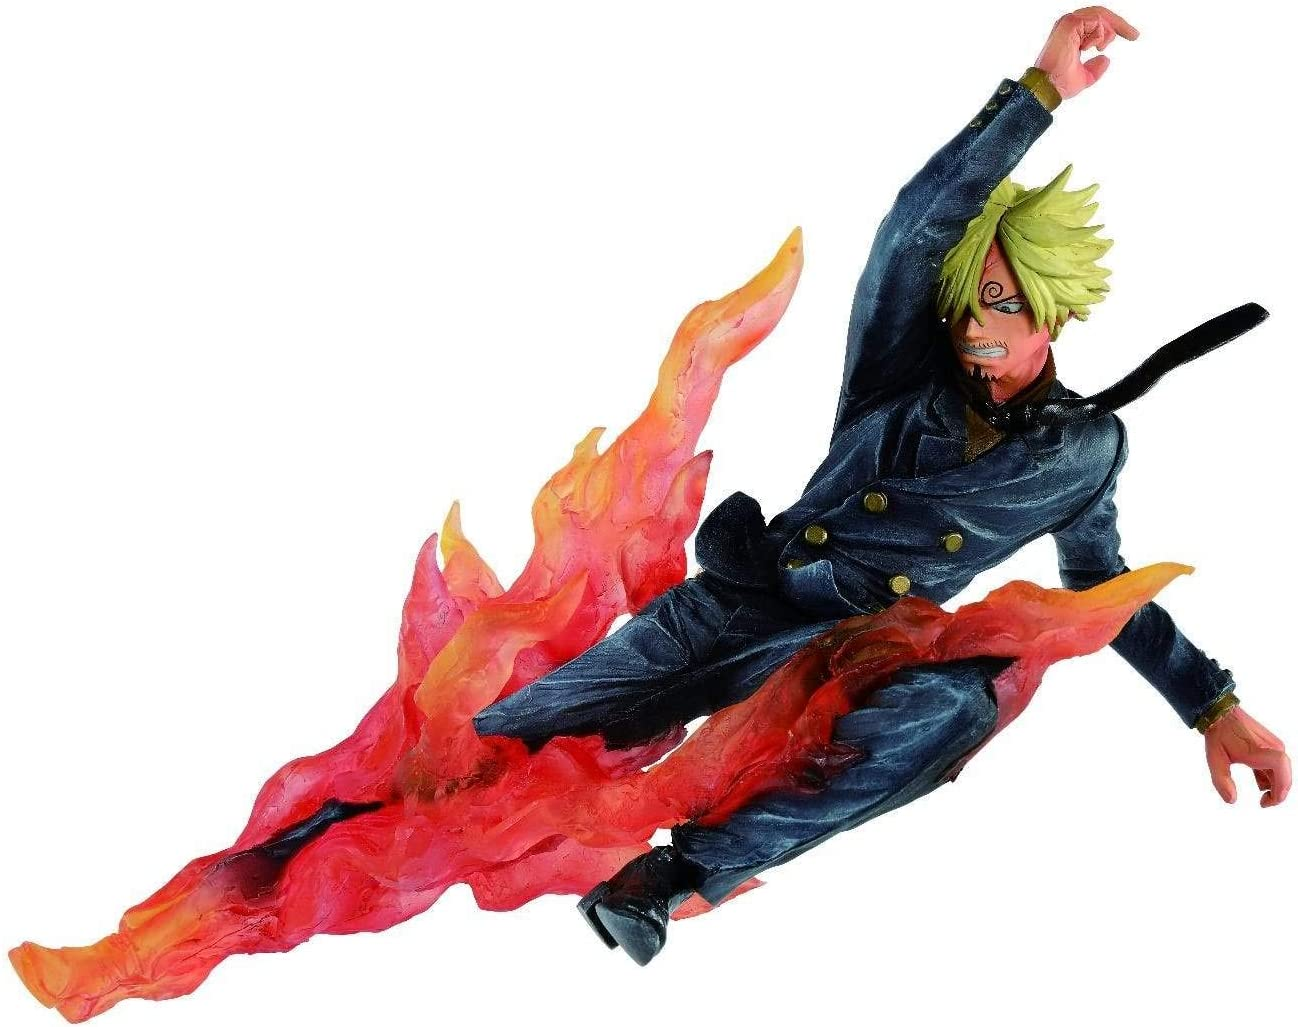 One Piece Ichibansho Ichiban Kuji Premium Figure Sabo Sumishiki Kaigi by BANDAI